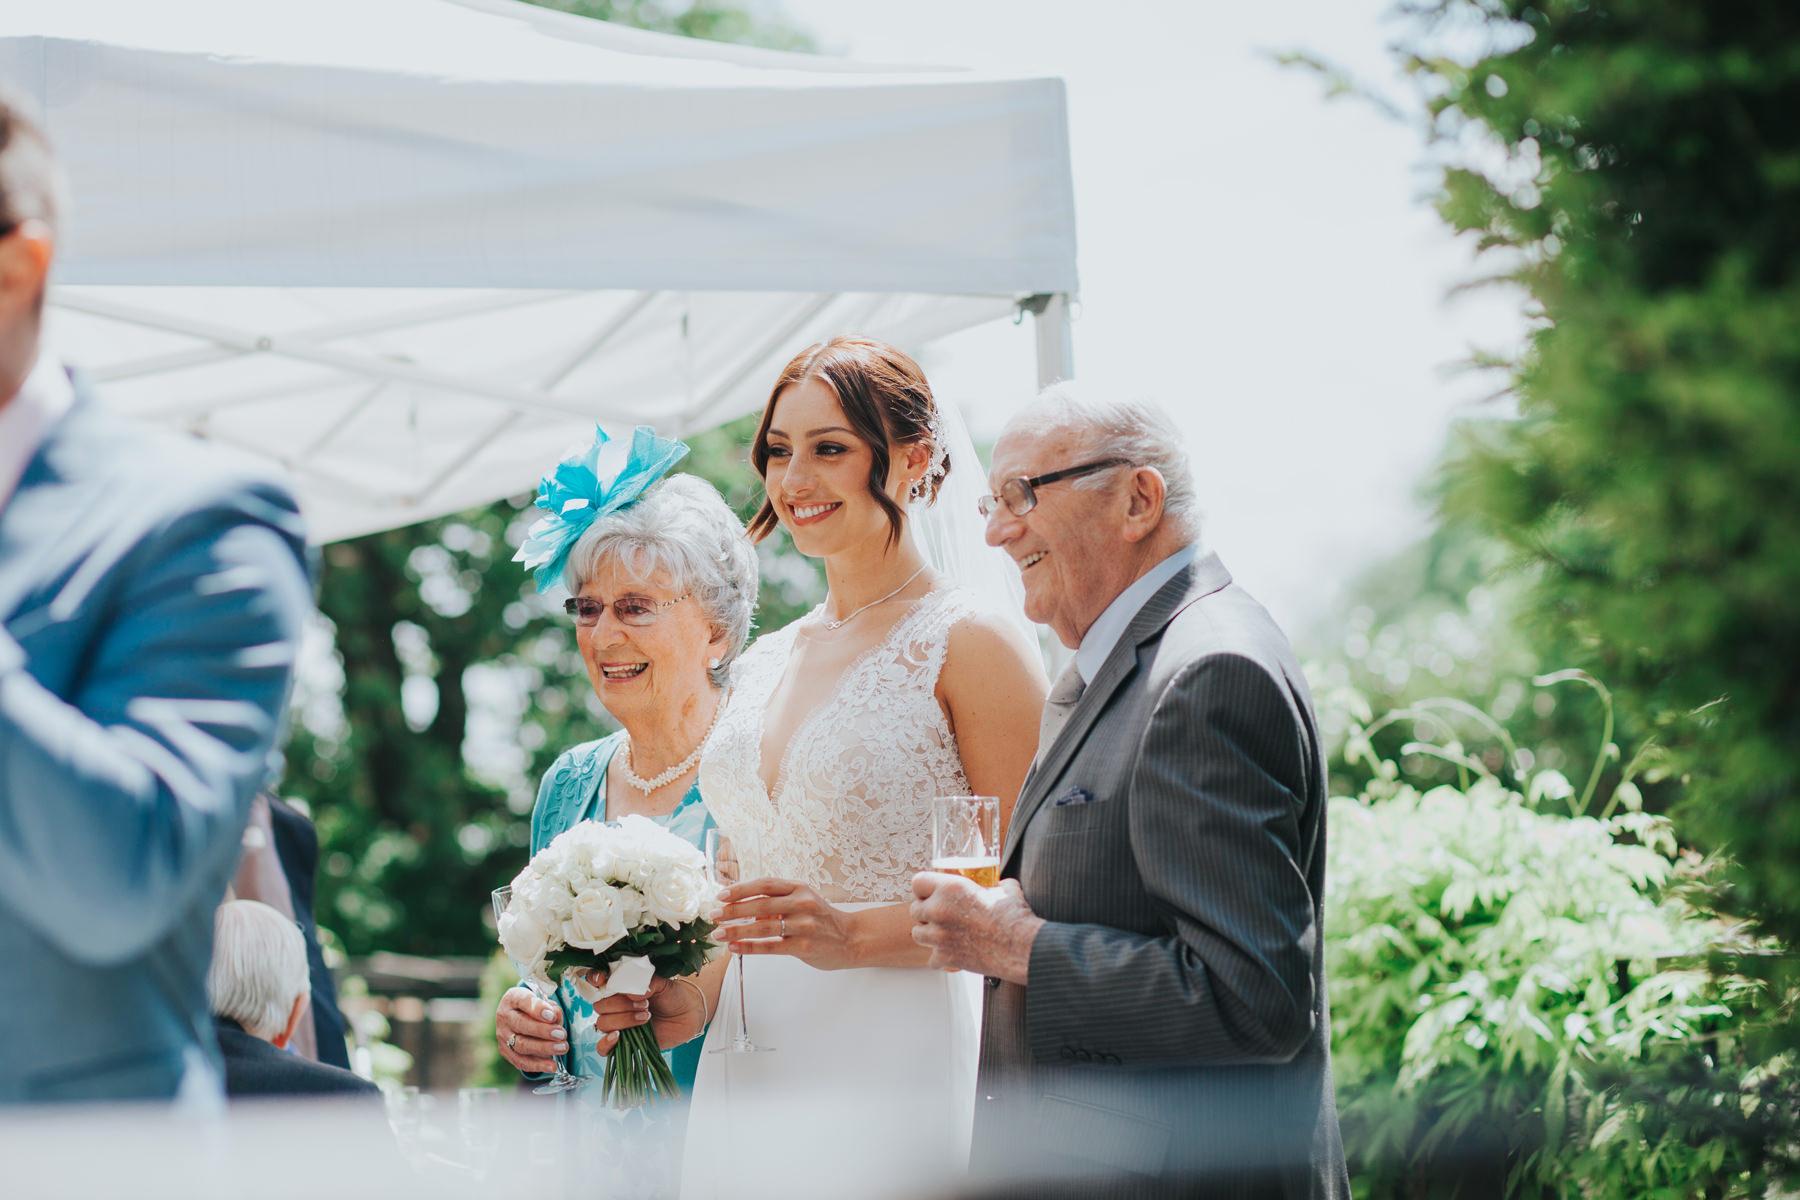 CRL-279-The Bingham wedding Richmond-reportage guest candid photographer.jpg